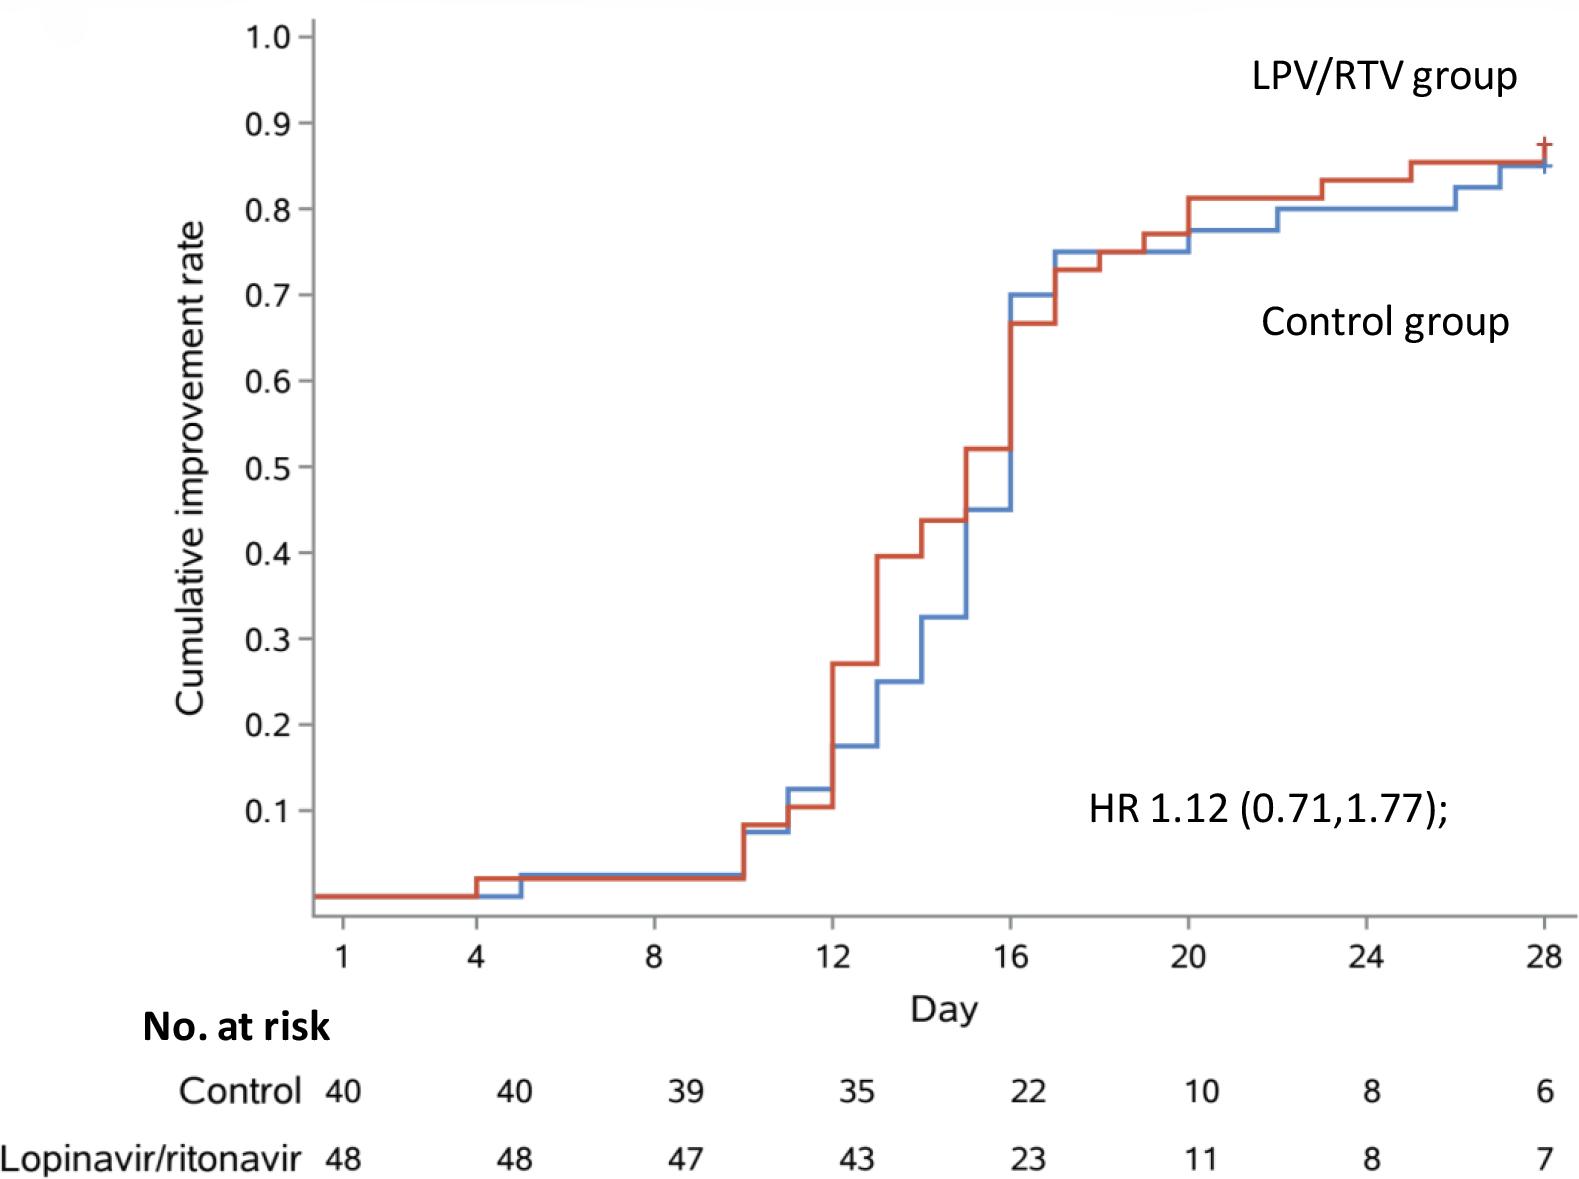 chictr2000029308 results 08 - Коронавирус. Лекарства. Лопинавир и ритонавир не помогли в лечении COVID-19